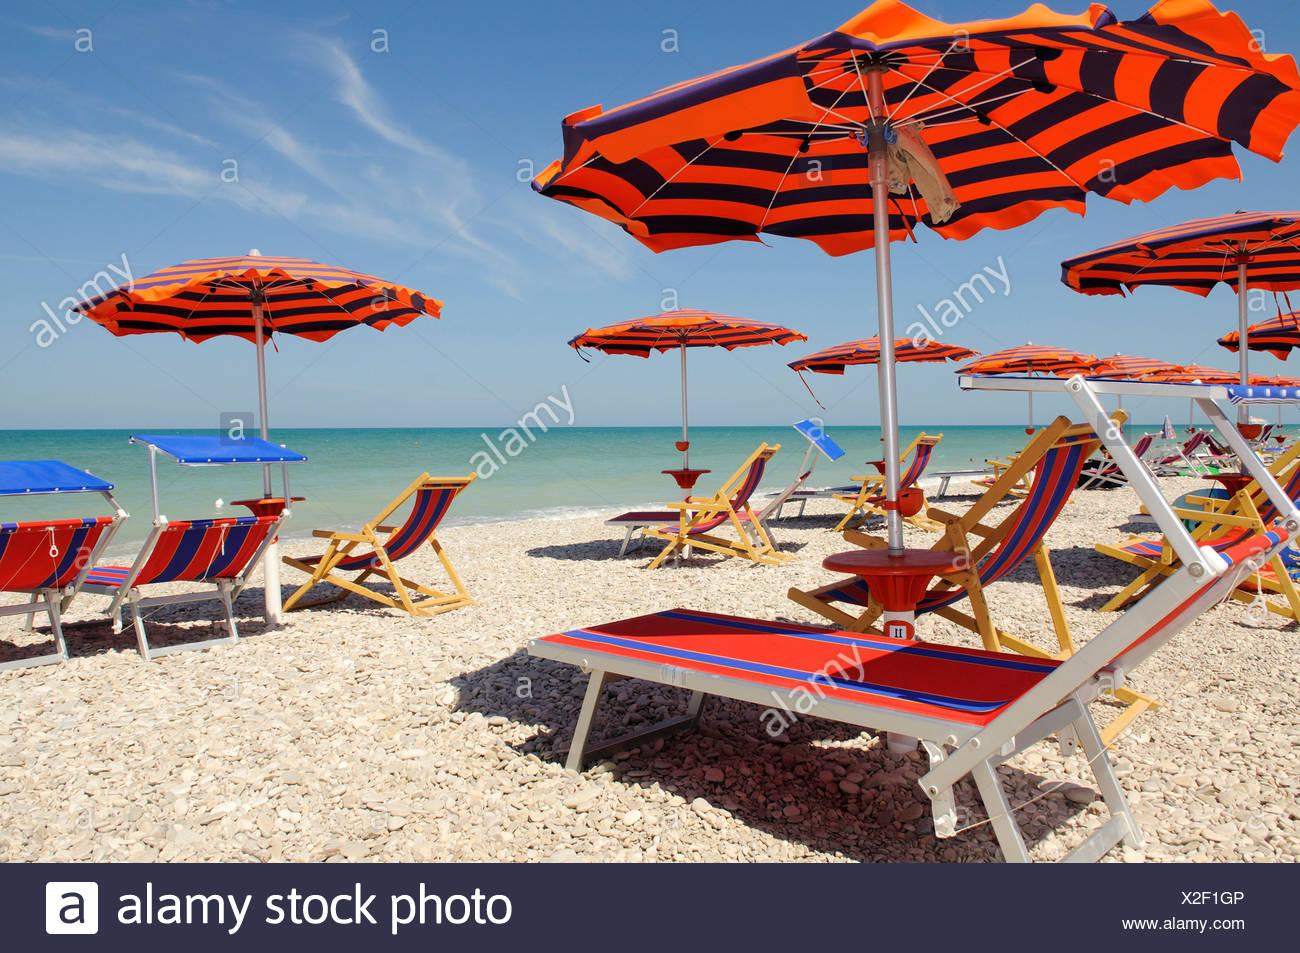 Sun umbrellas and deckchairs on the beach of Pineto, Abruzzi, Europe Stock Photo